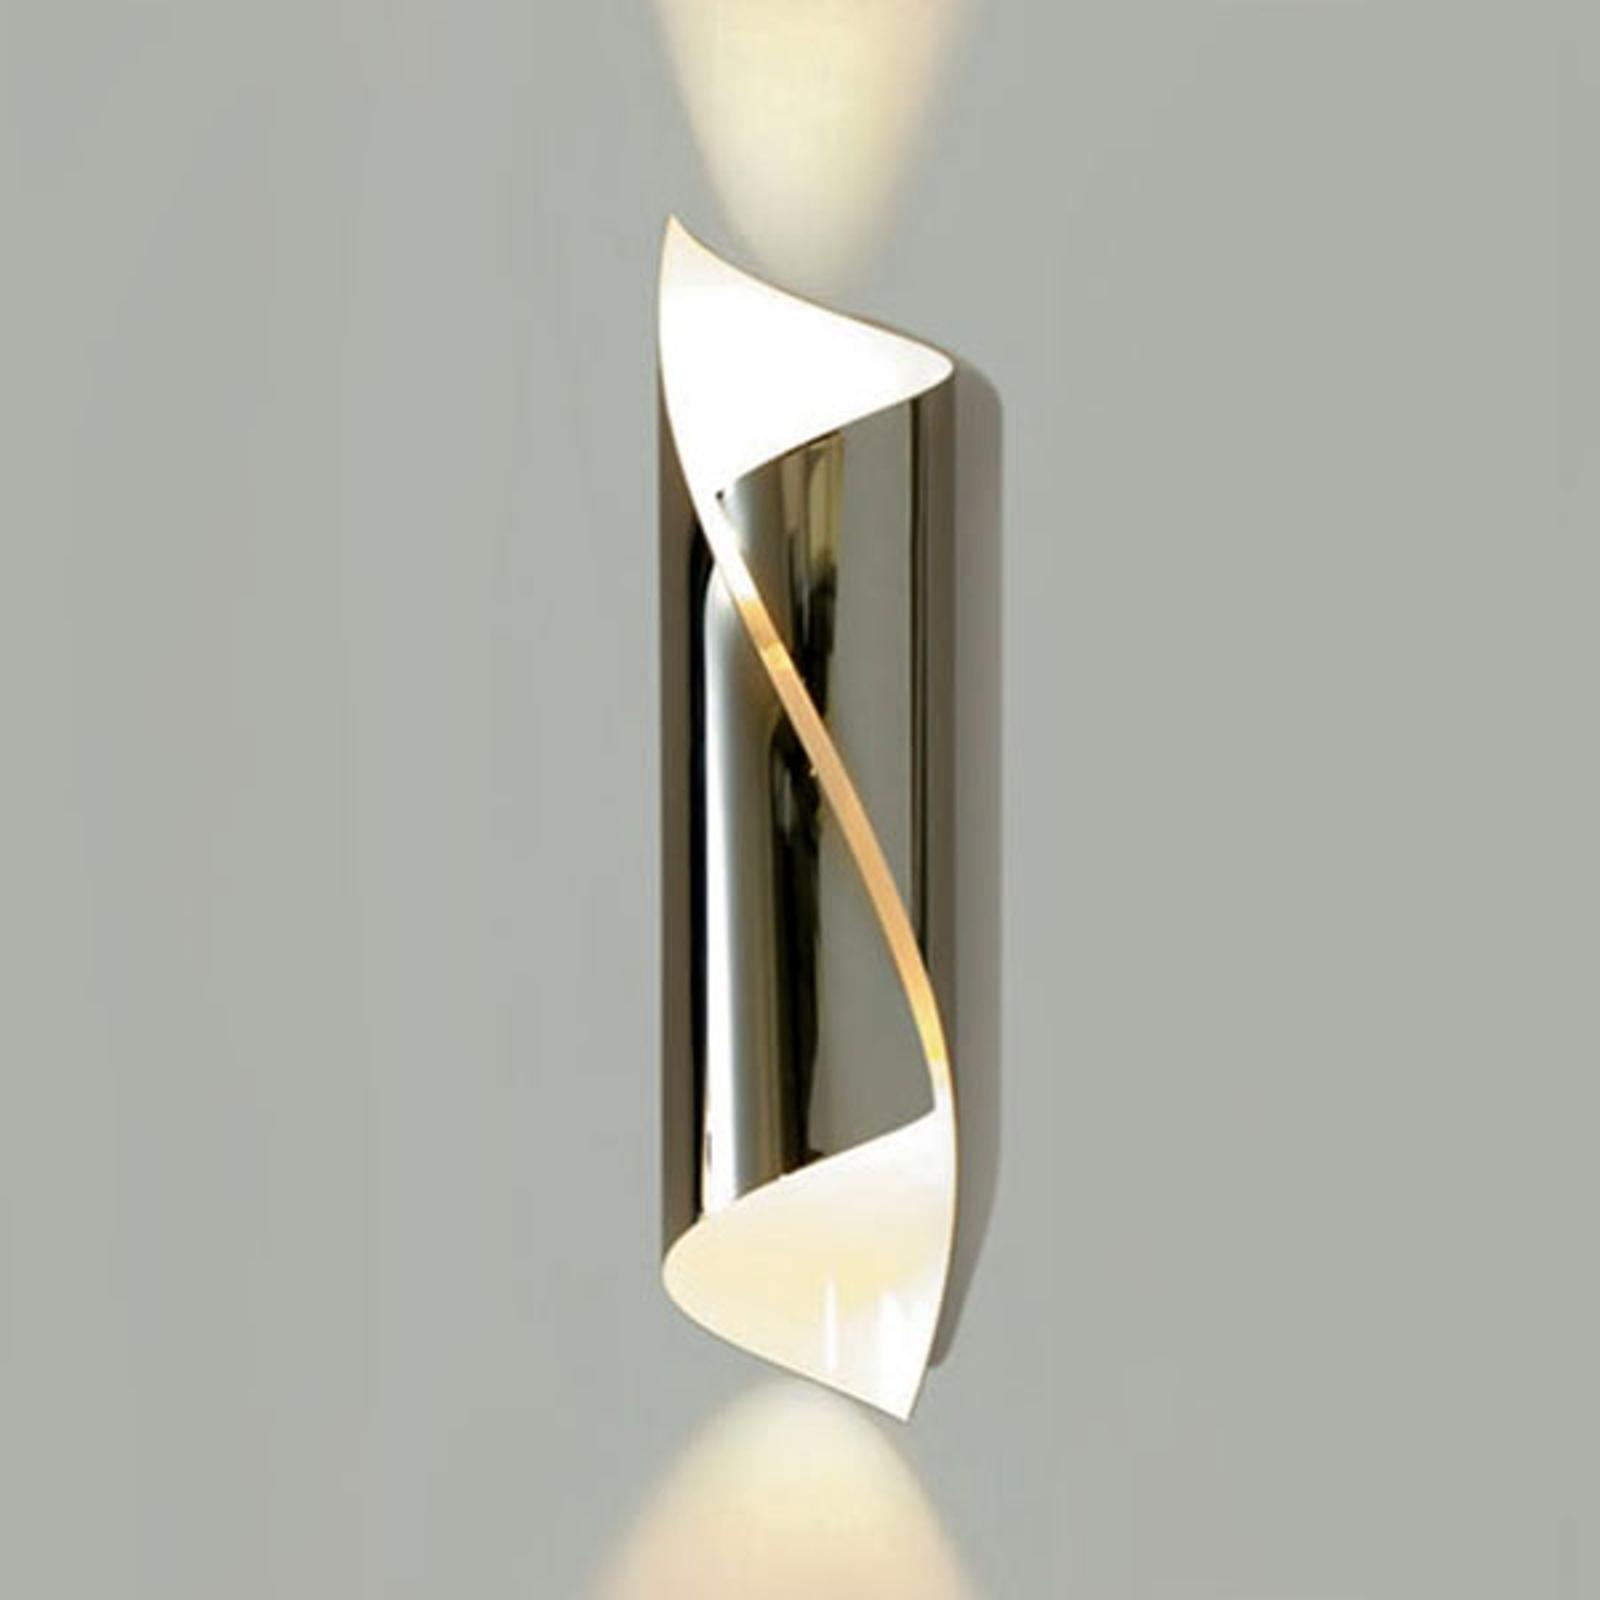 Knikerboker Hué - applique LED de designer